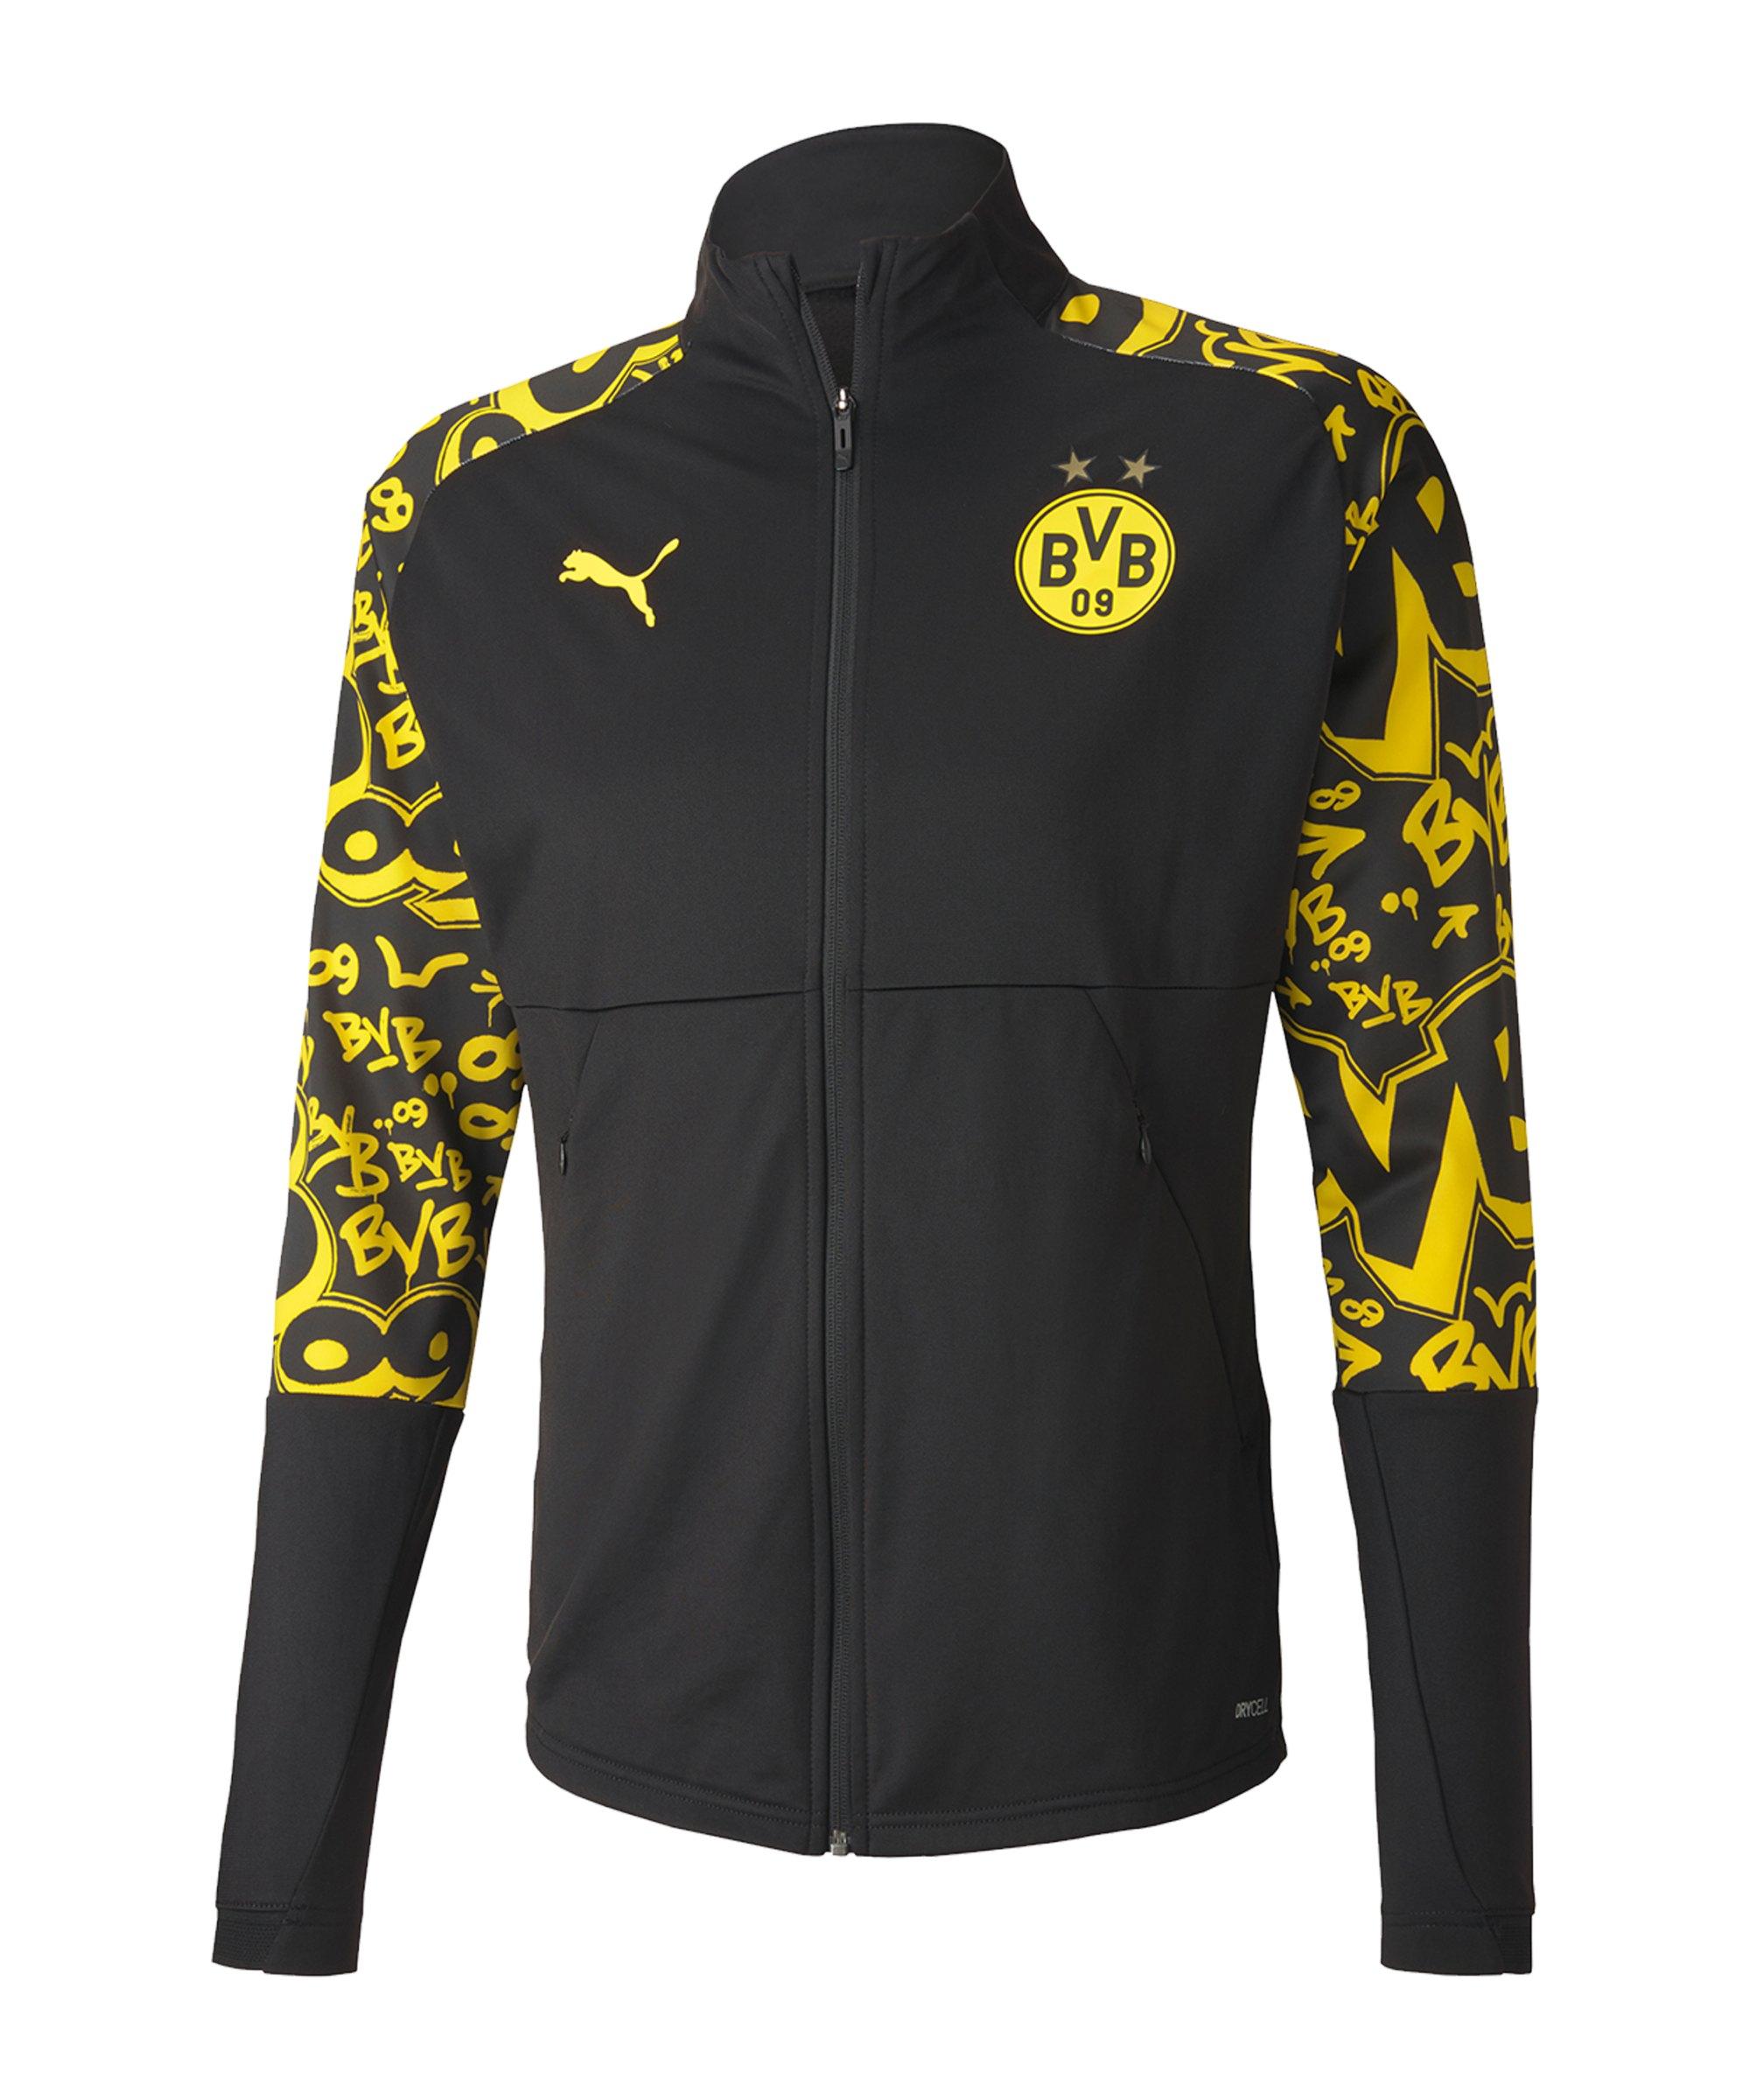 PUMA BVB Dortmund Stadium Jacke Schwarz F05 - schwarz